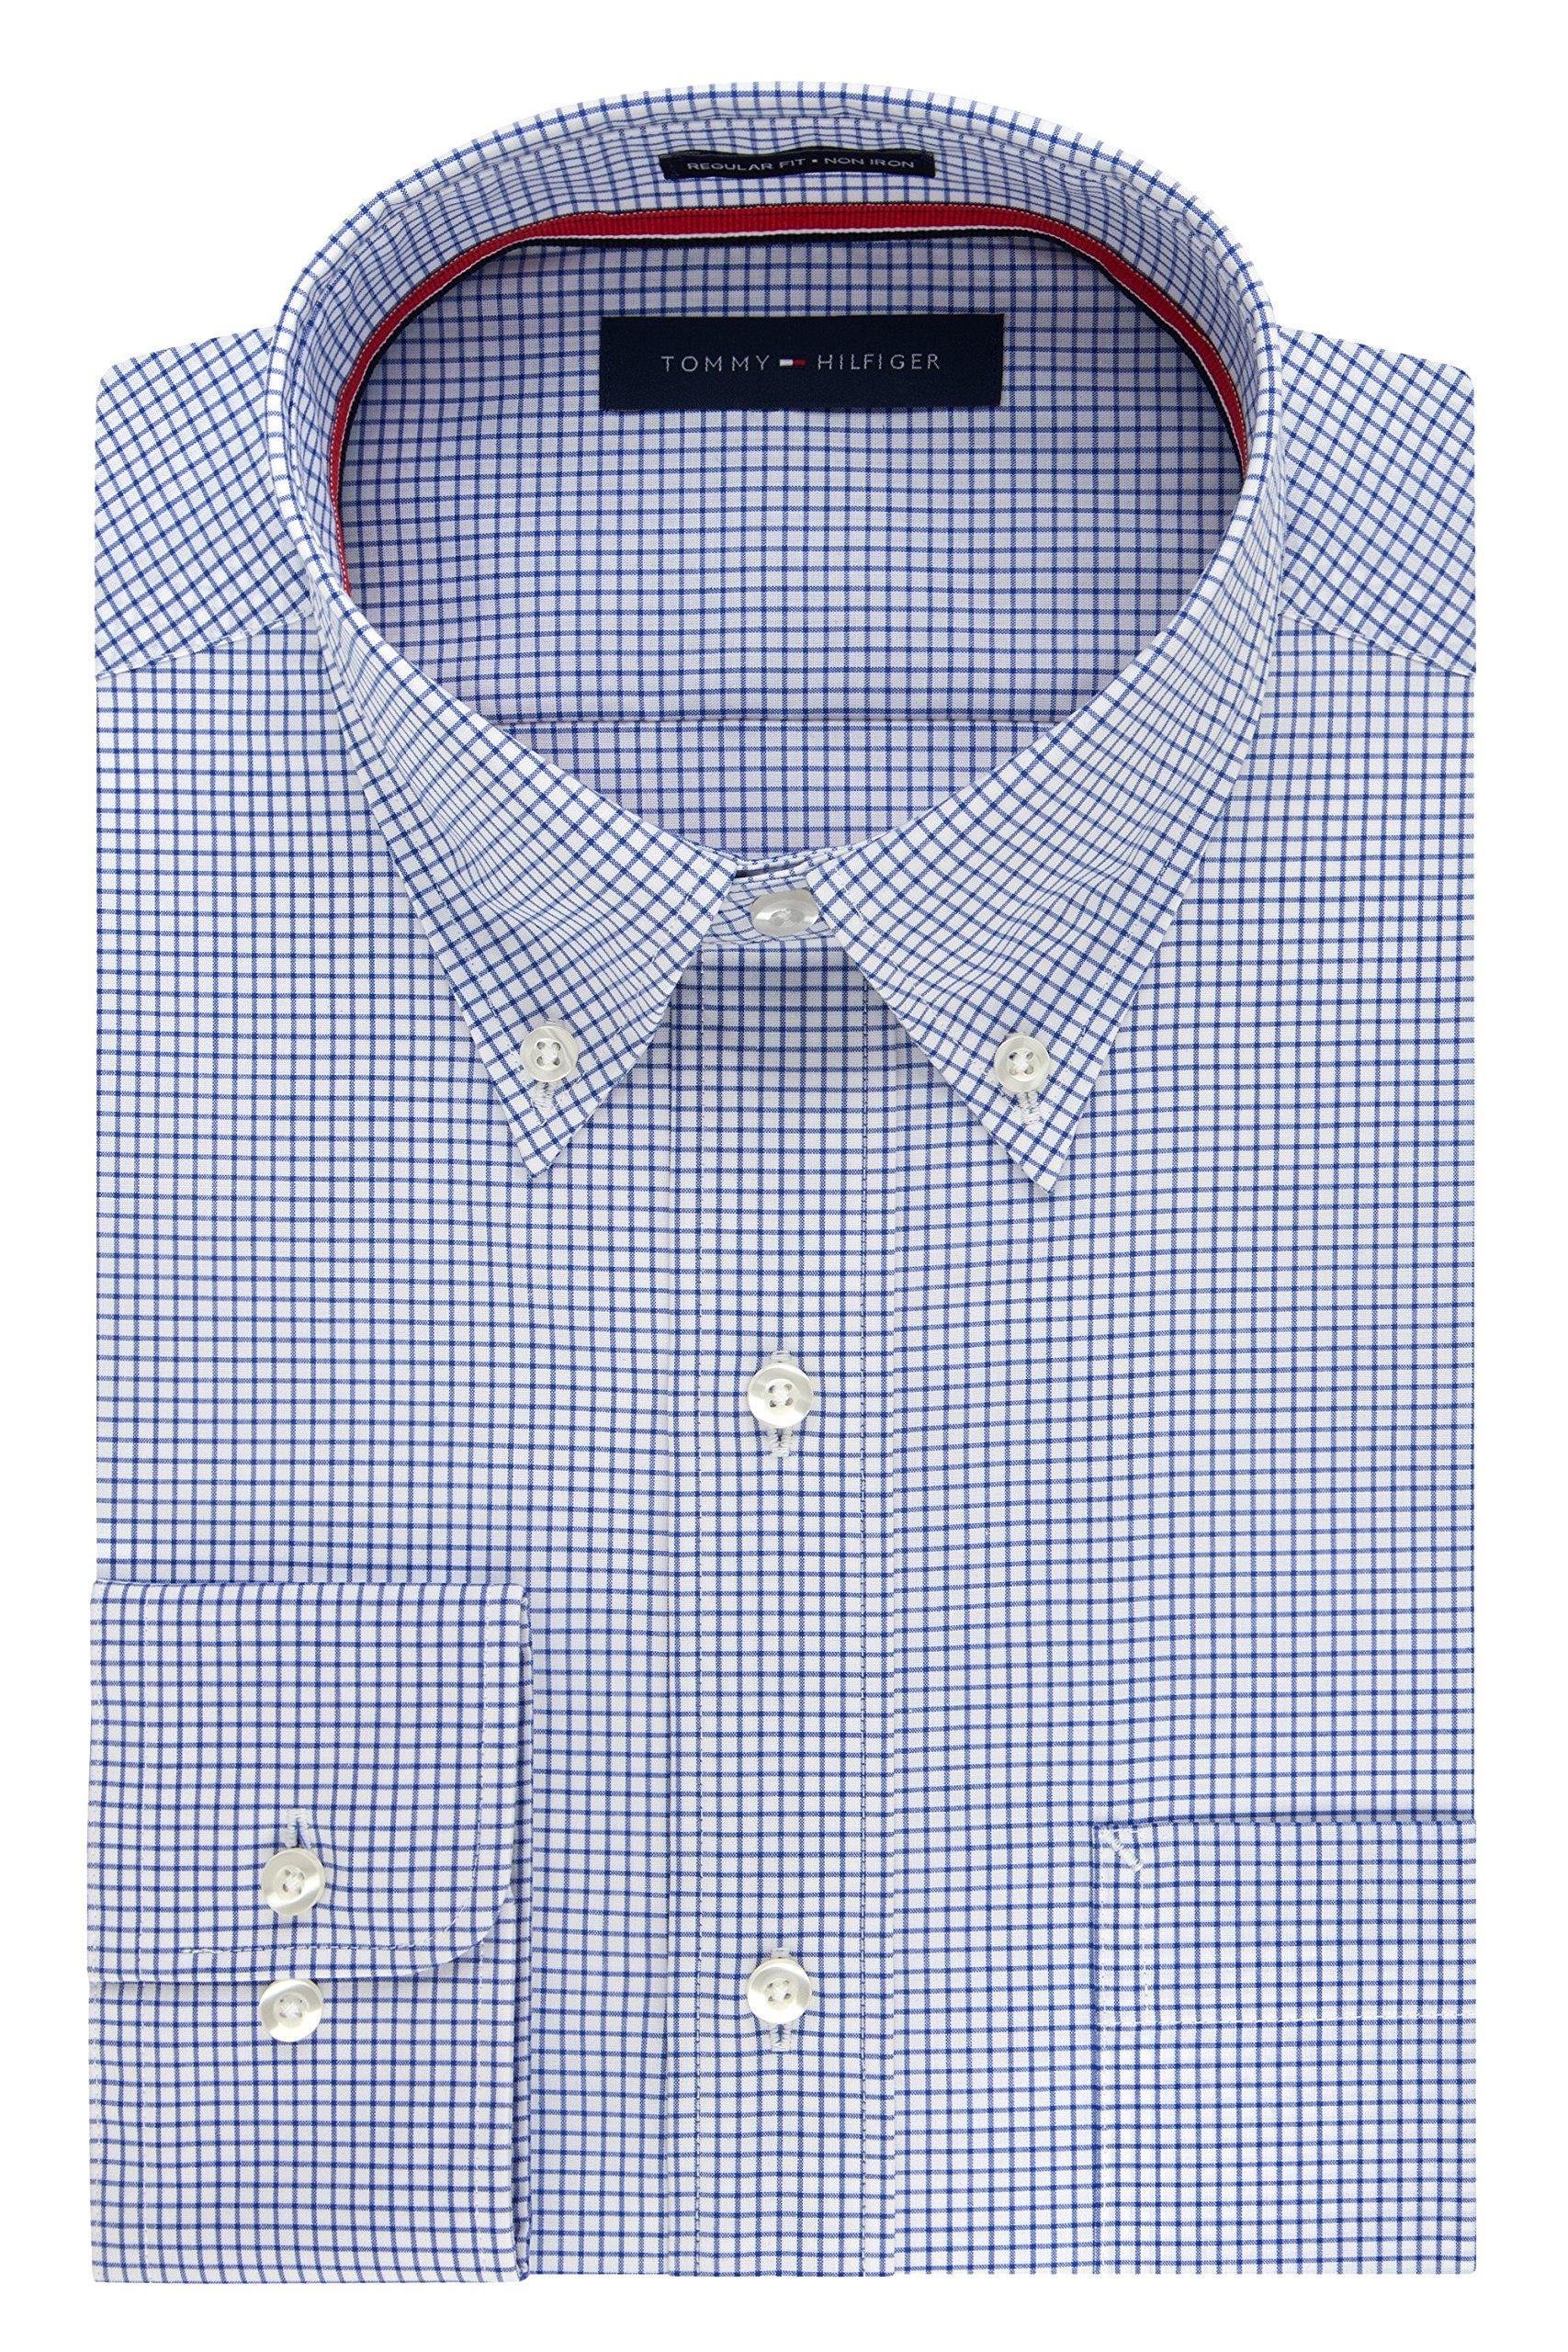 Tommy Hilfiger Men's Long Button Down Shirt, Empire Blue, 18.5'' Neck 34''-35'' Sleeve